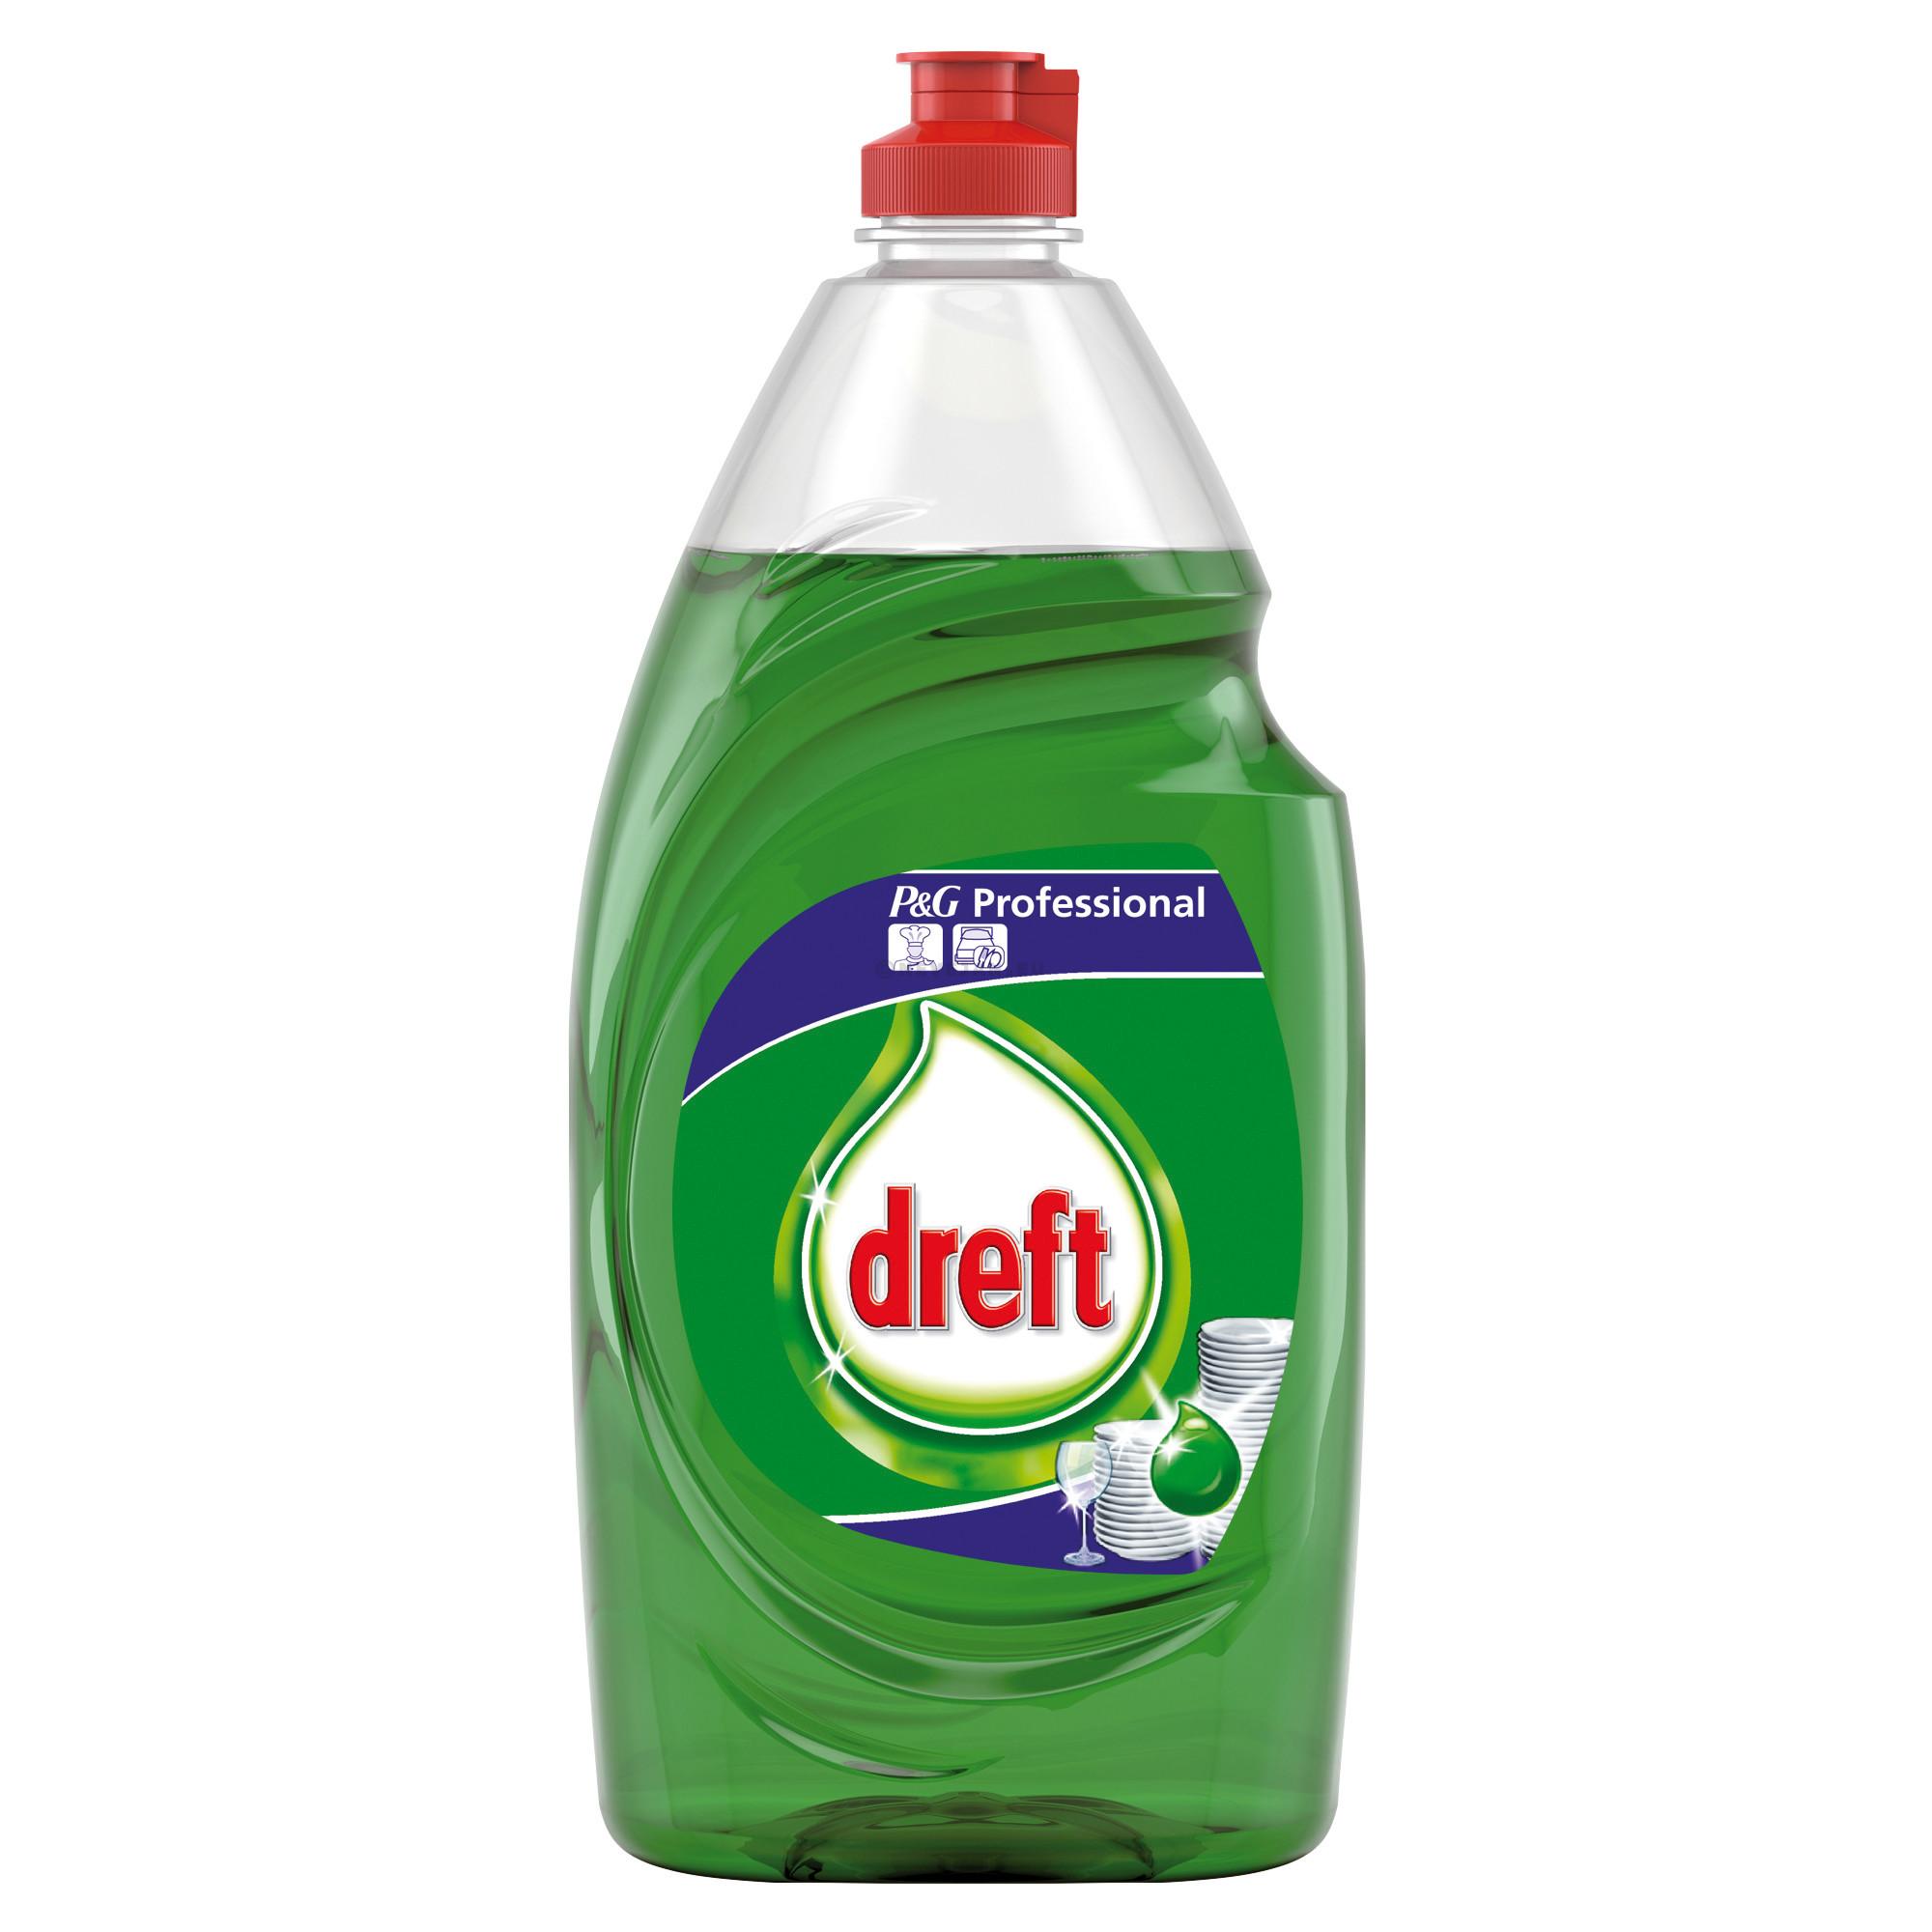 Dreft handafwasmiddel 1l profesional